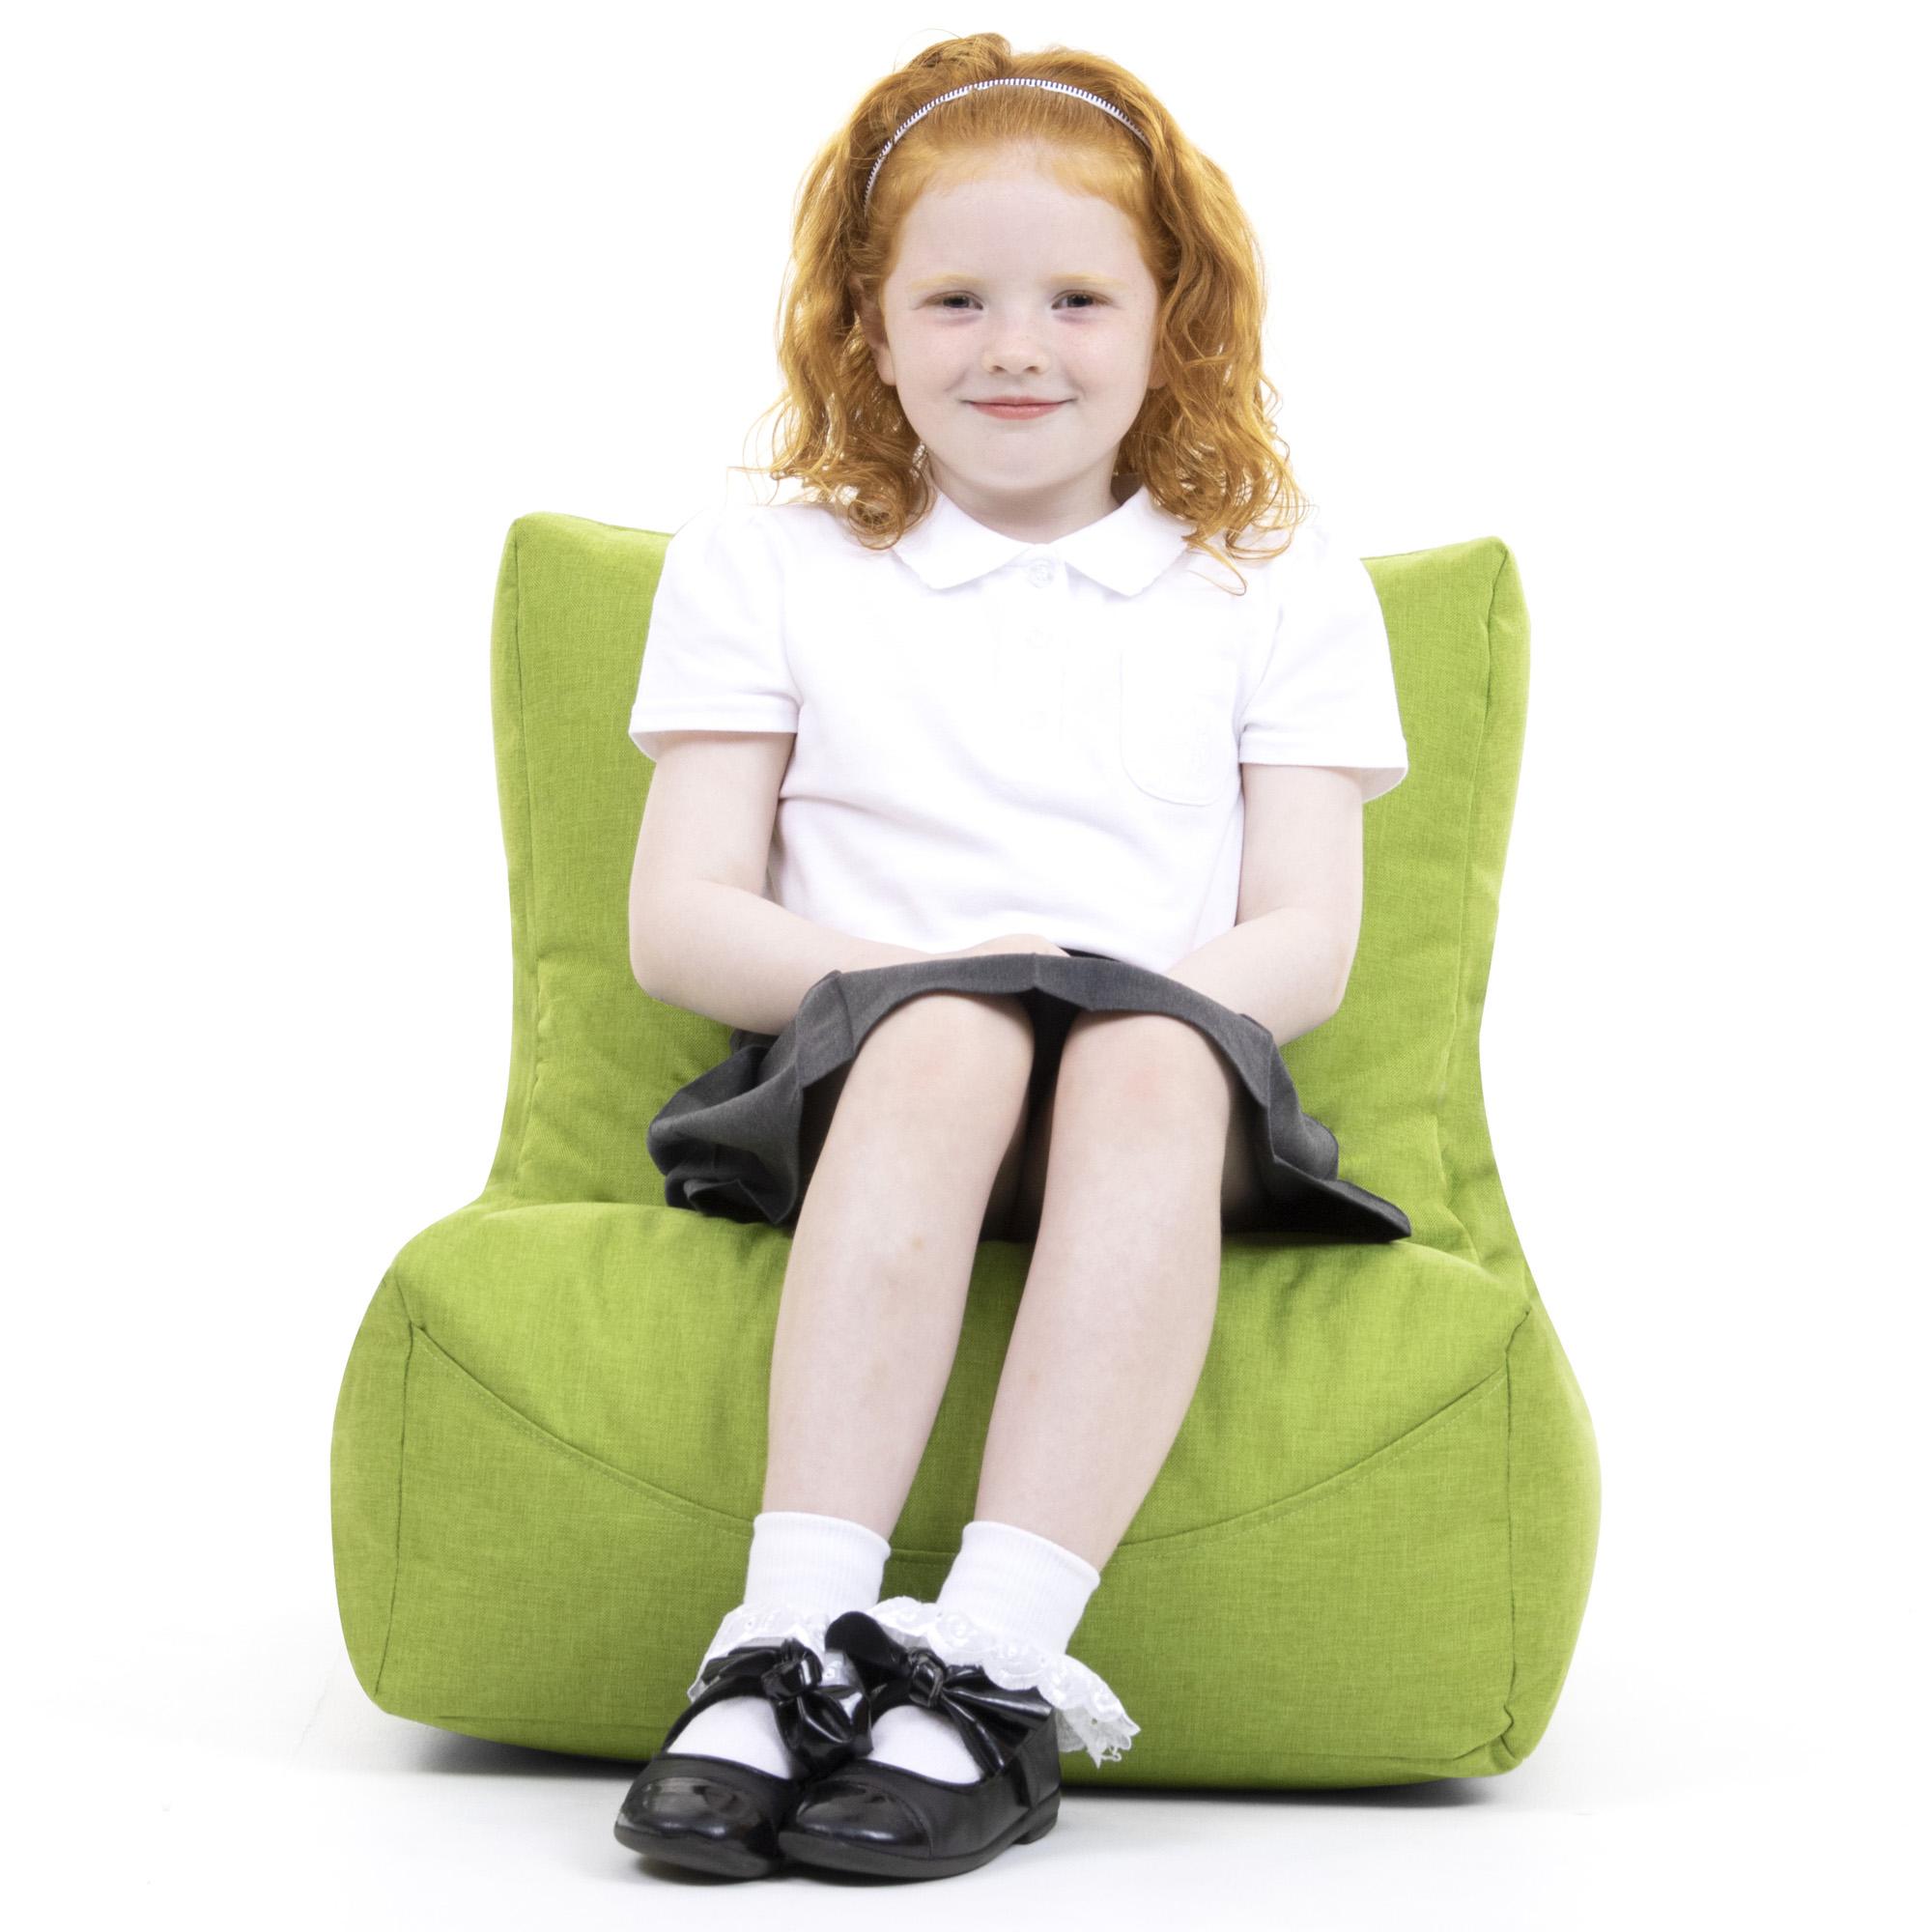 Eden-PRI-Smile-Chair-Lime-3-300dpi